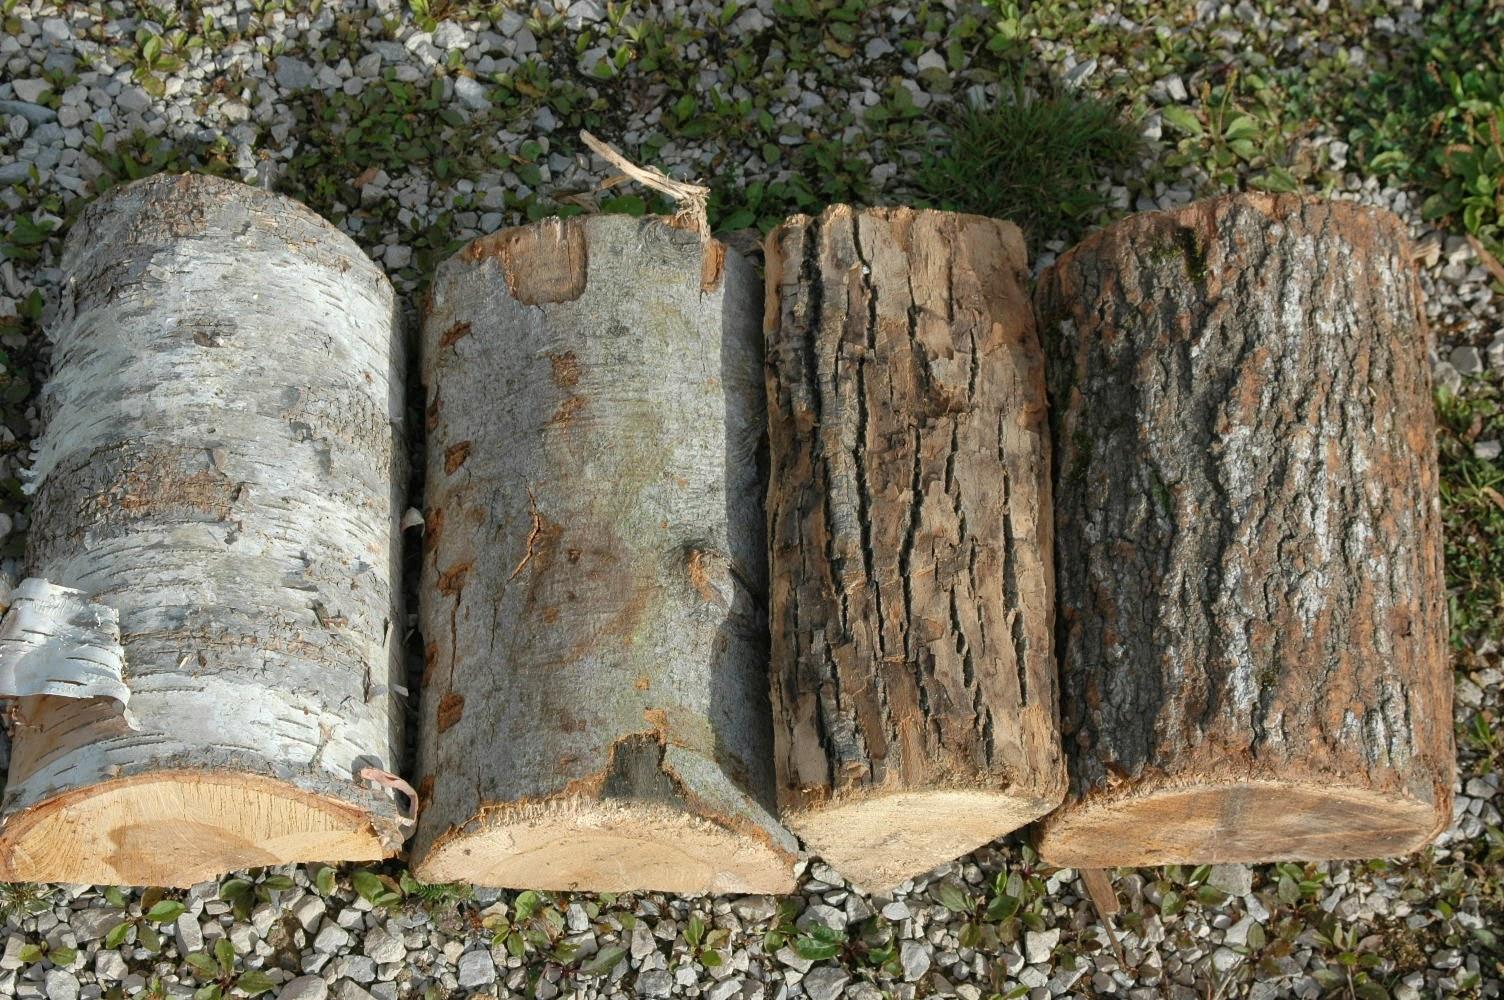 Roche fleurie garden firewood